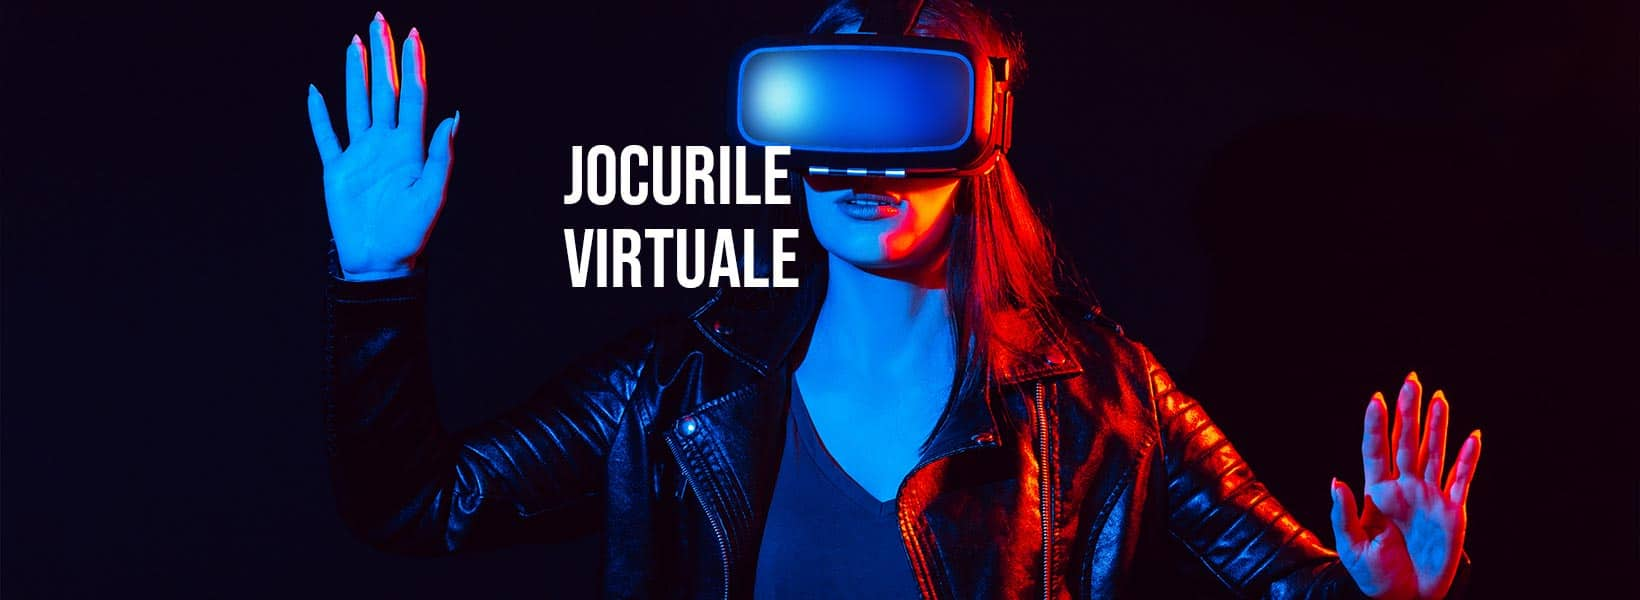 jocuri virtuale